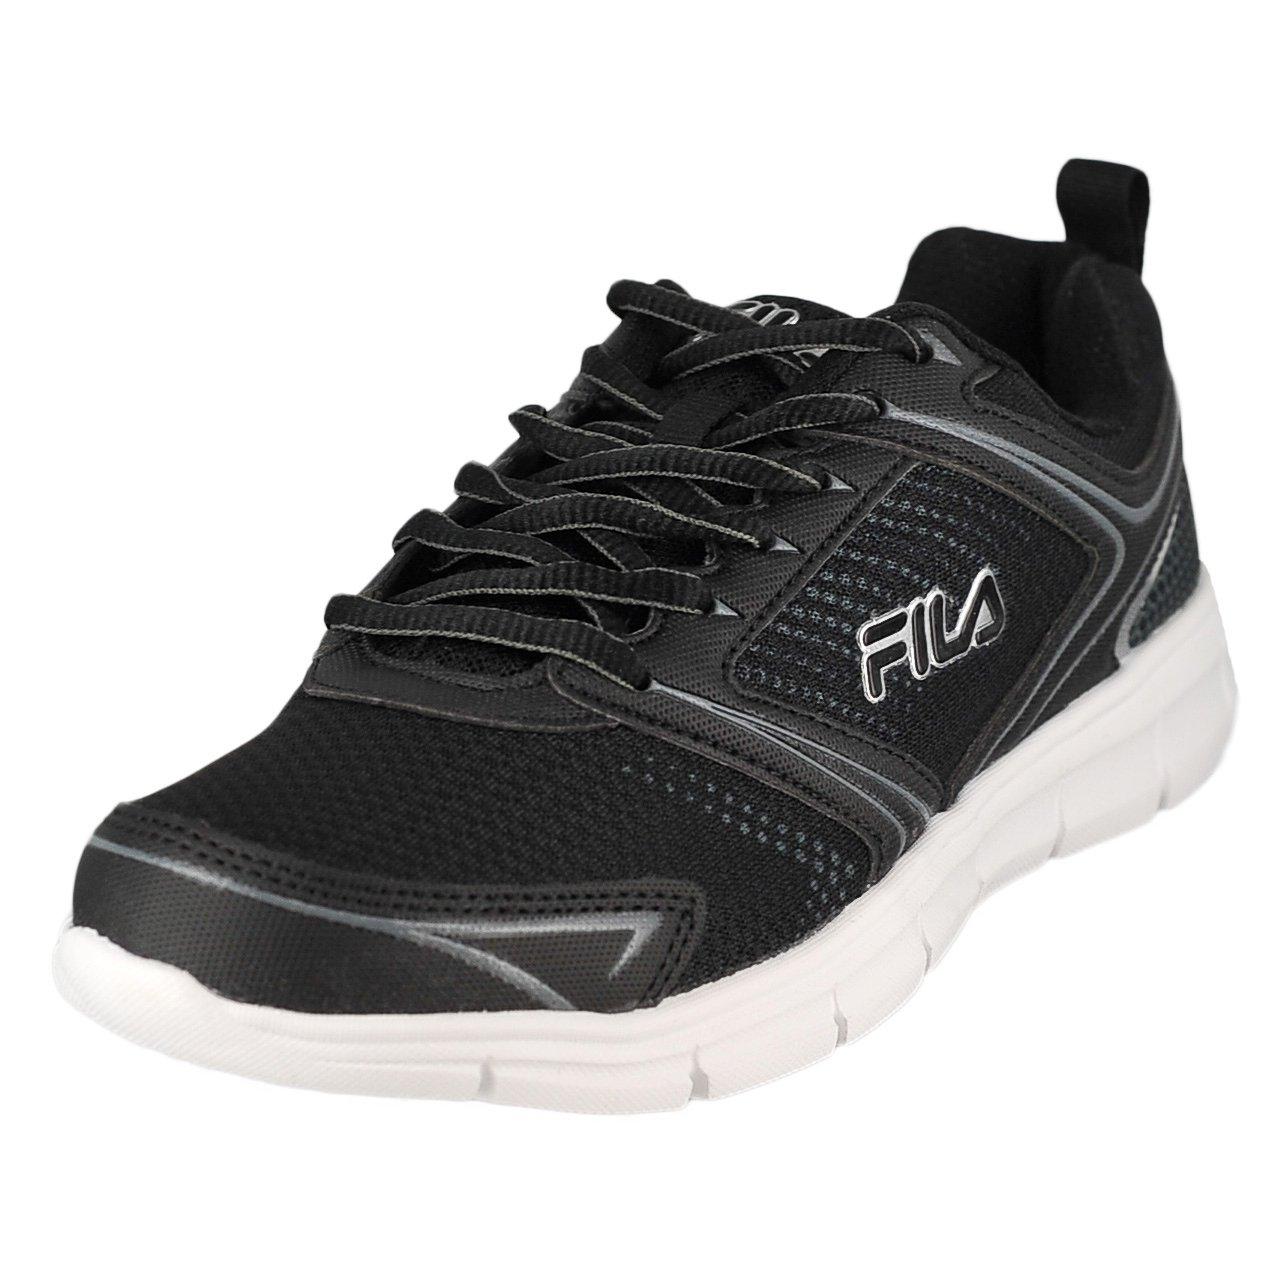 Fila Windstar 2 Black/Black/Metallic Silver Mens Running Size 13